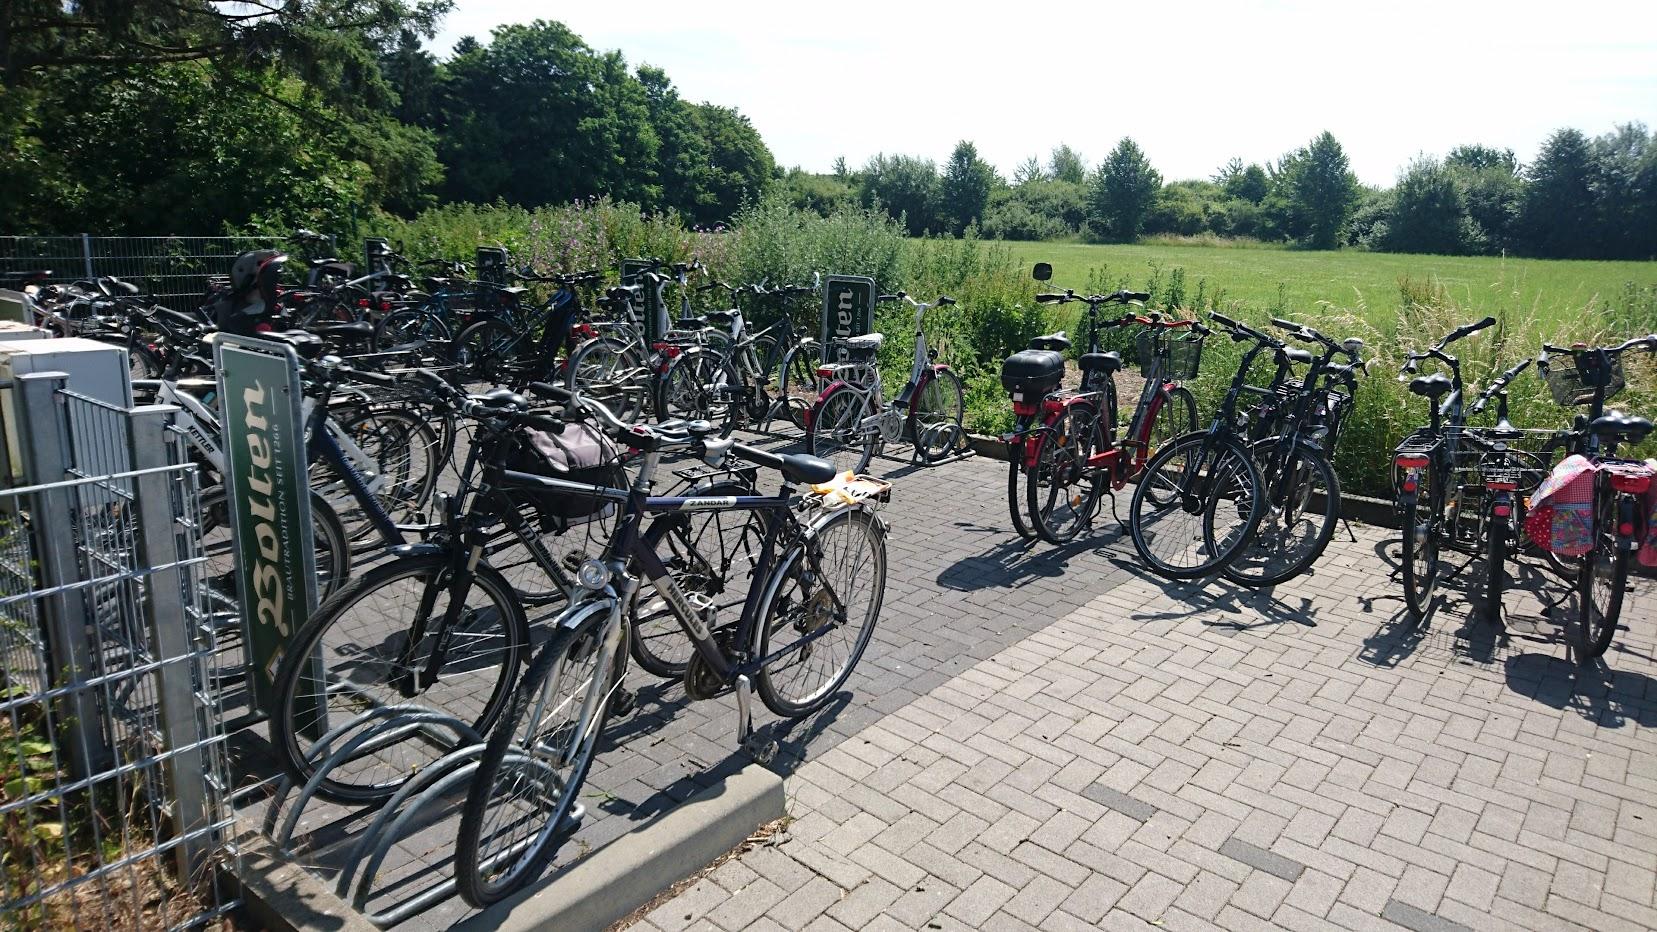 BOLTENs Picknick Biergarten Fahrrad